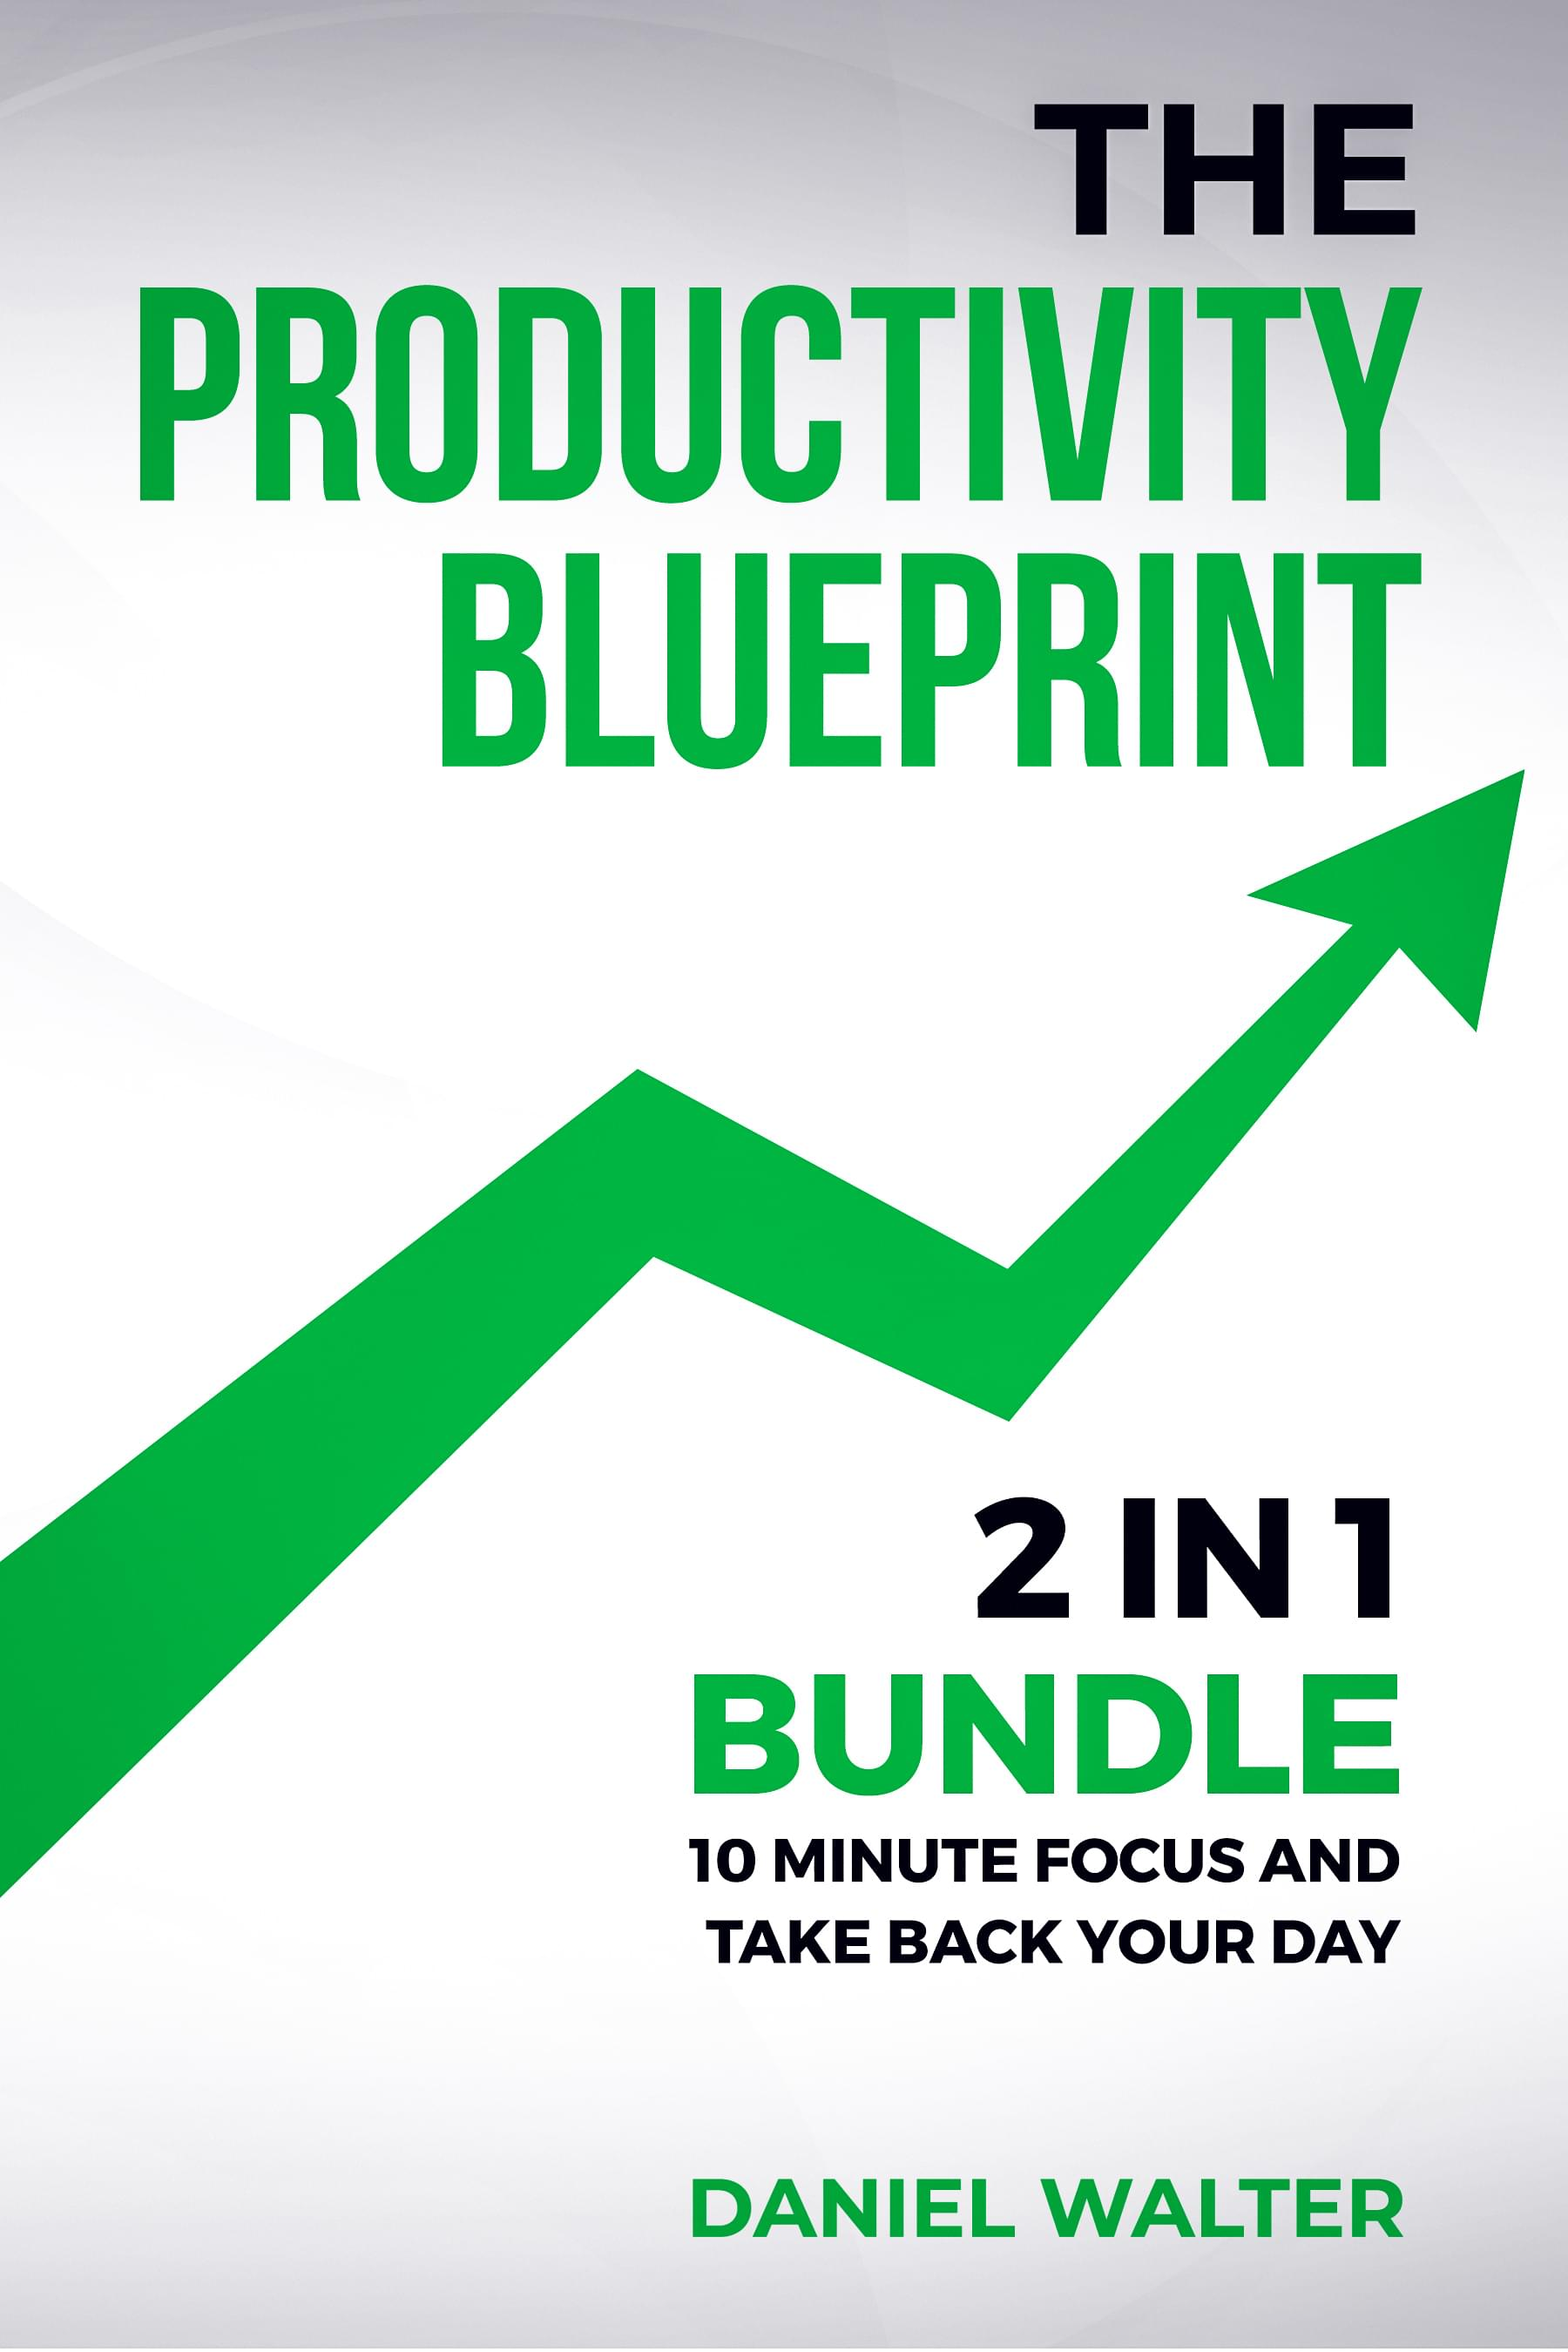 The Productivity Blueprint  by Daniel Walter